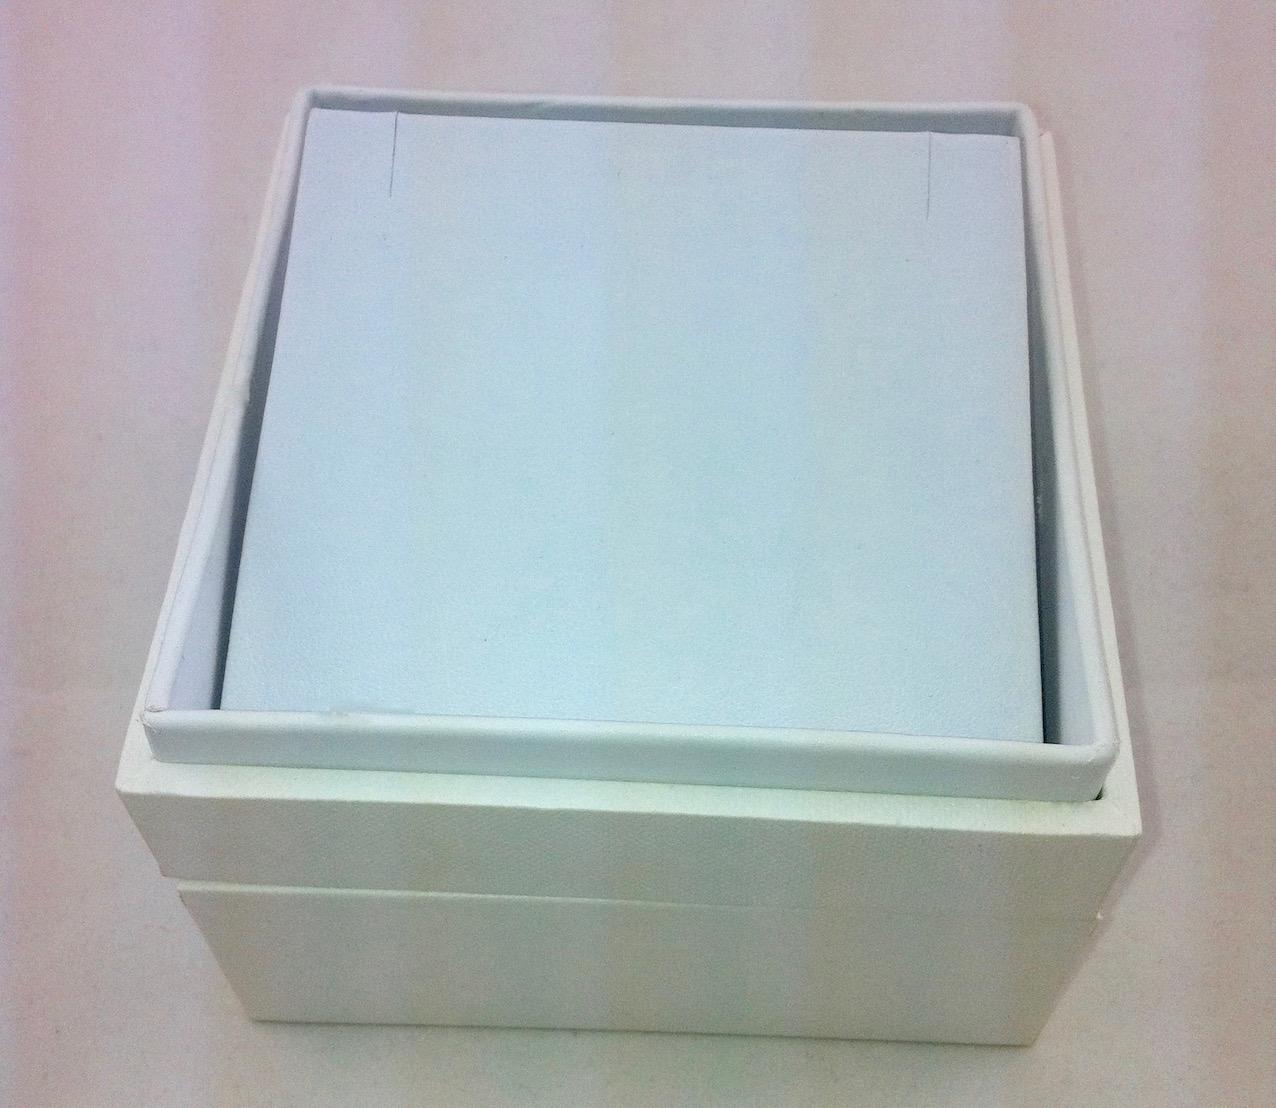 X Large white earring box